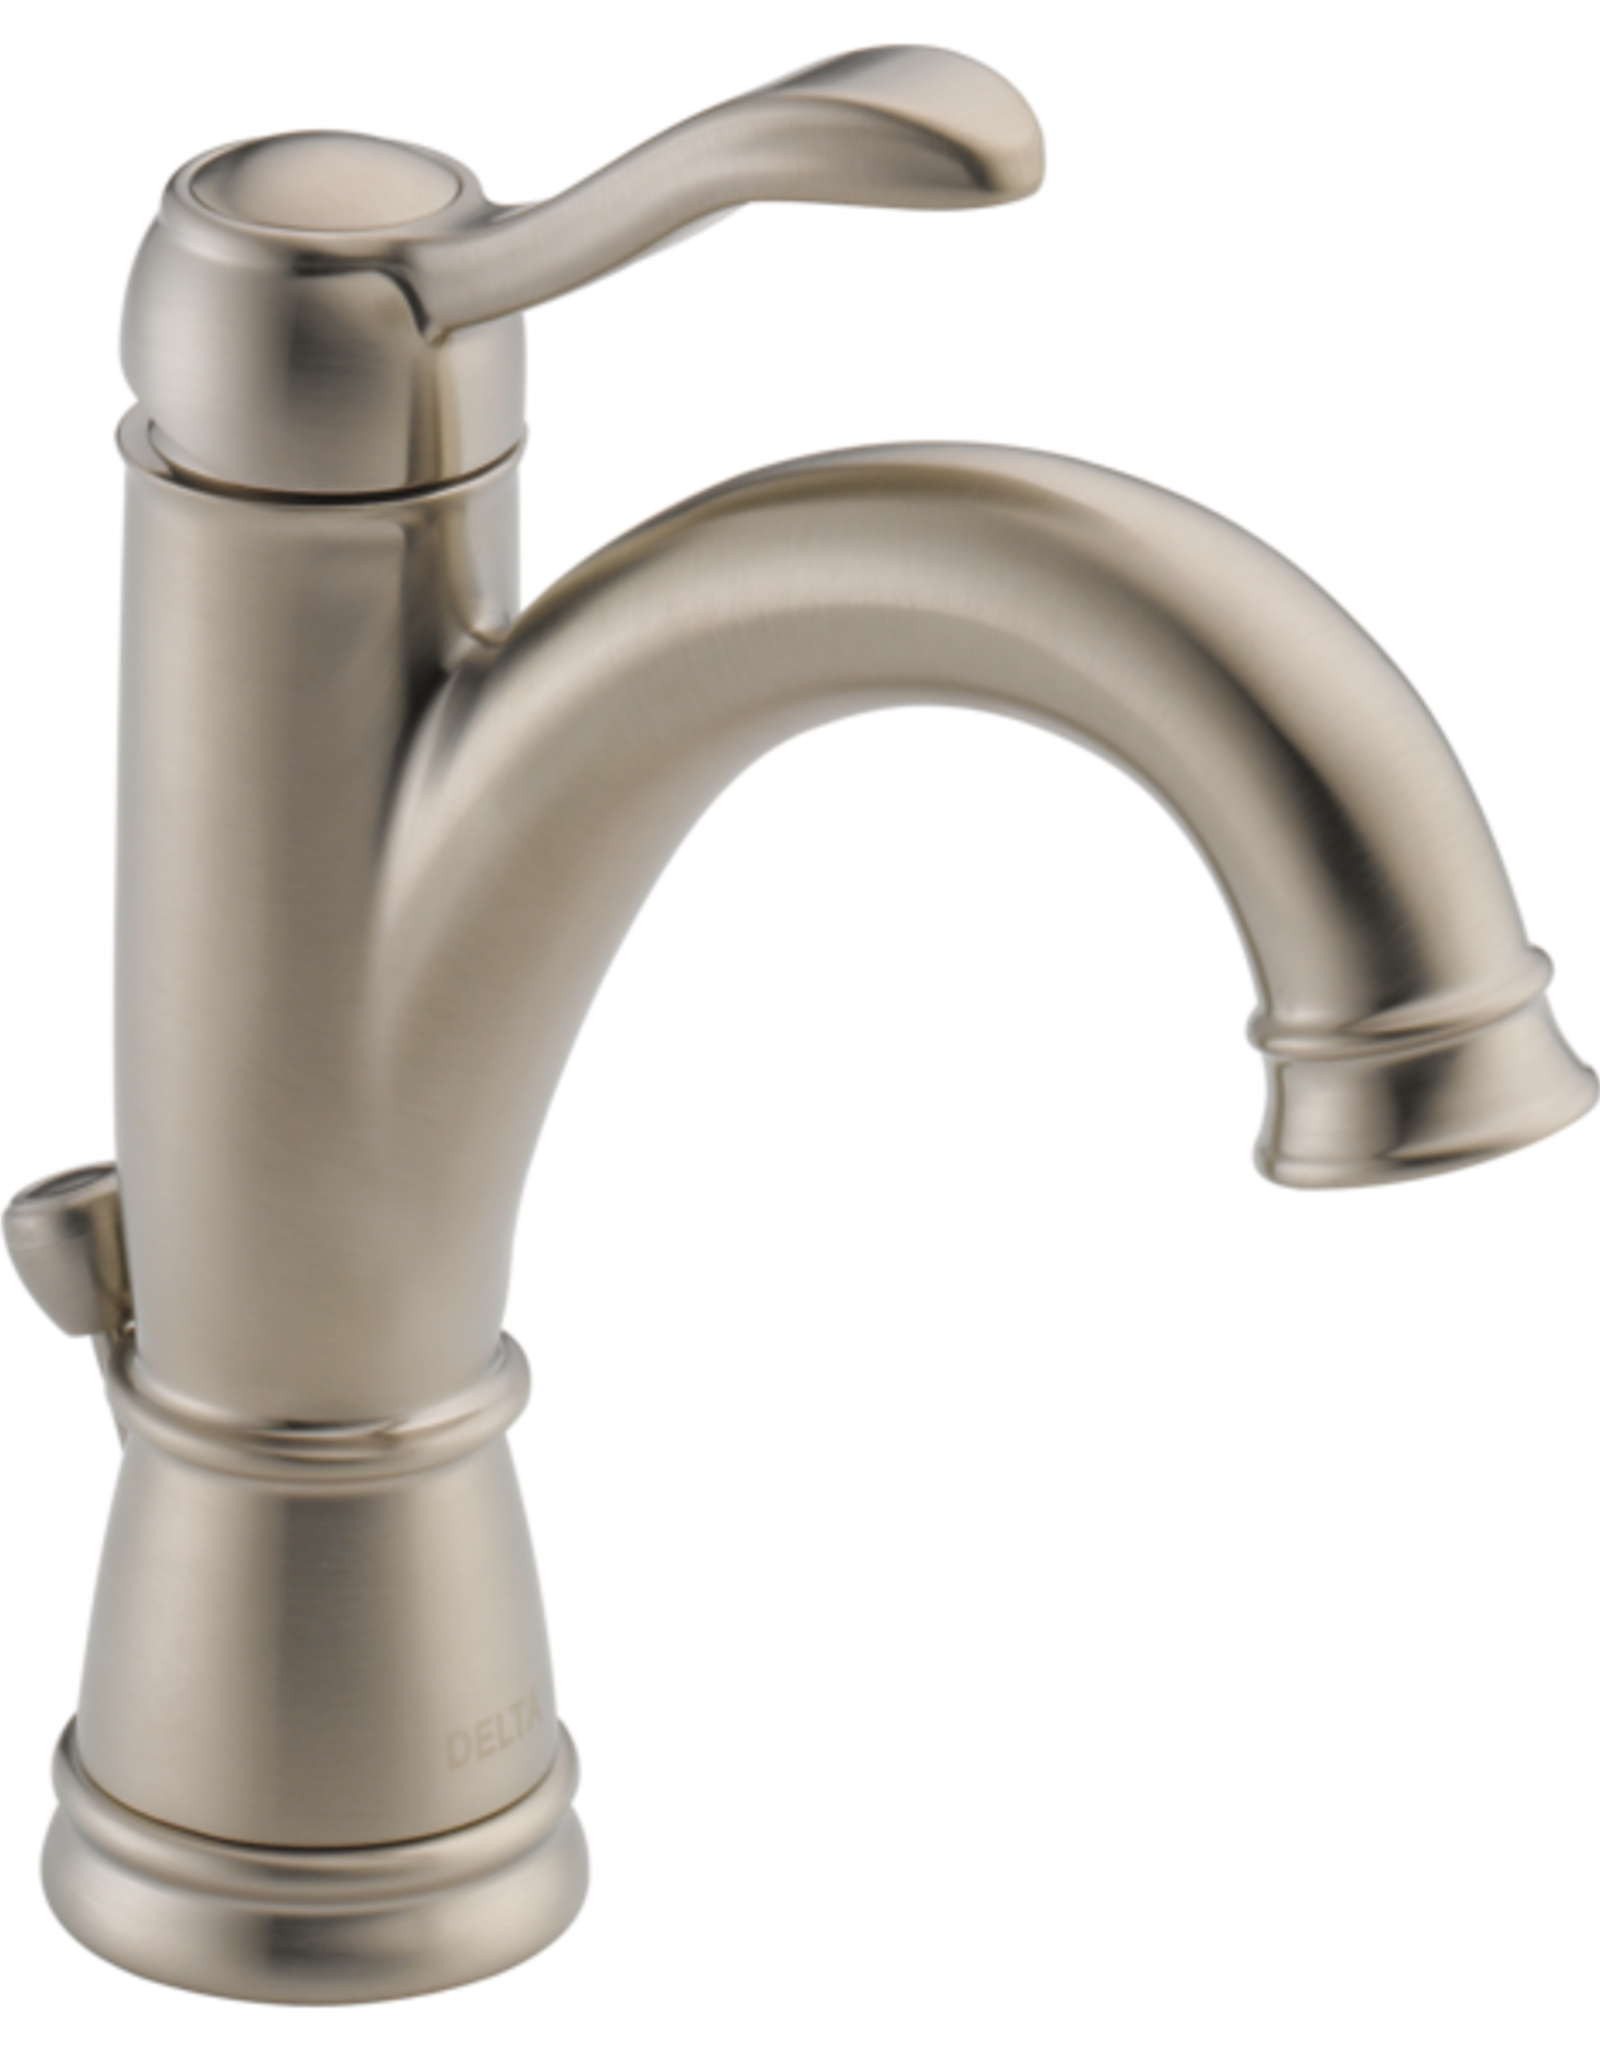 Delta Delta Porter Brushed Nickel Single Handle Lav Faucet